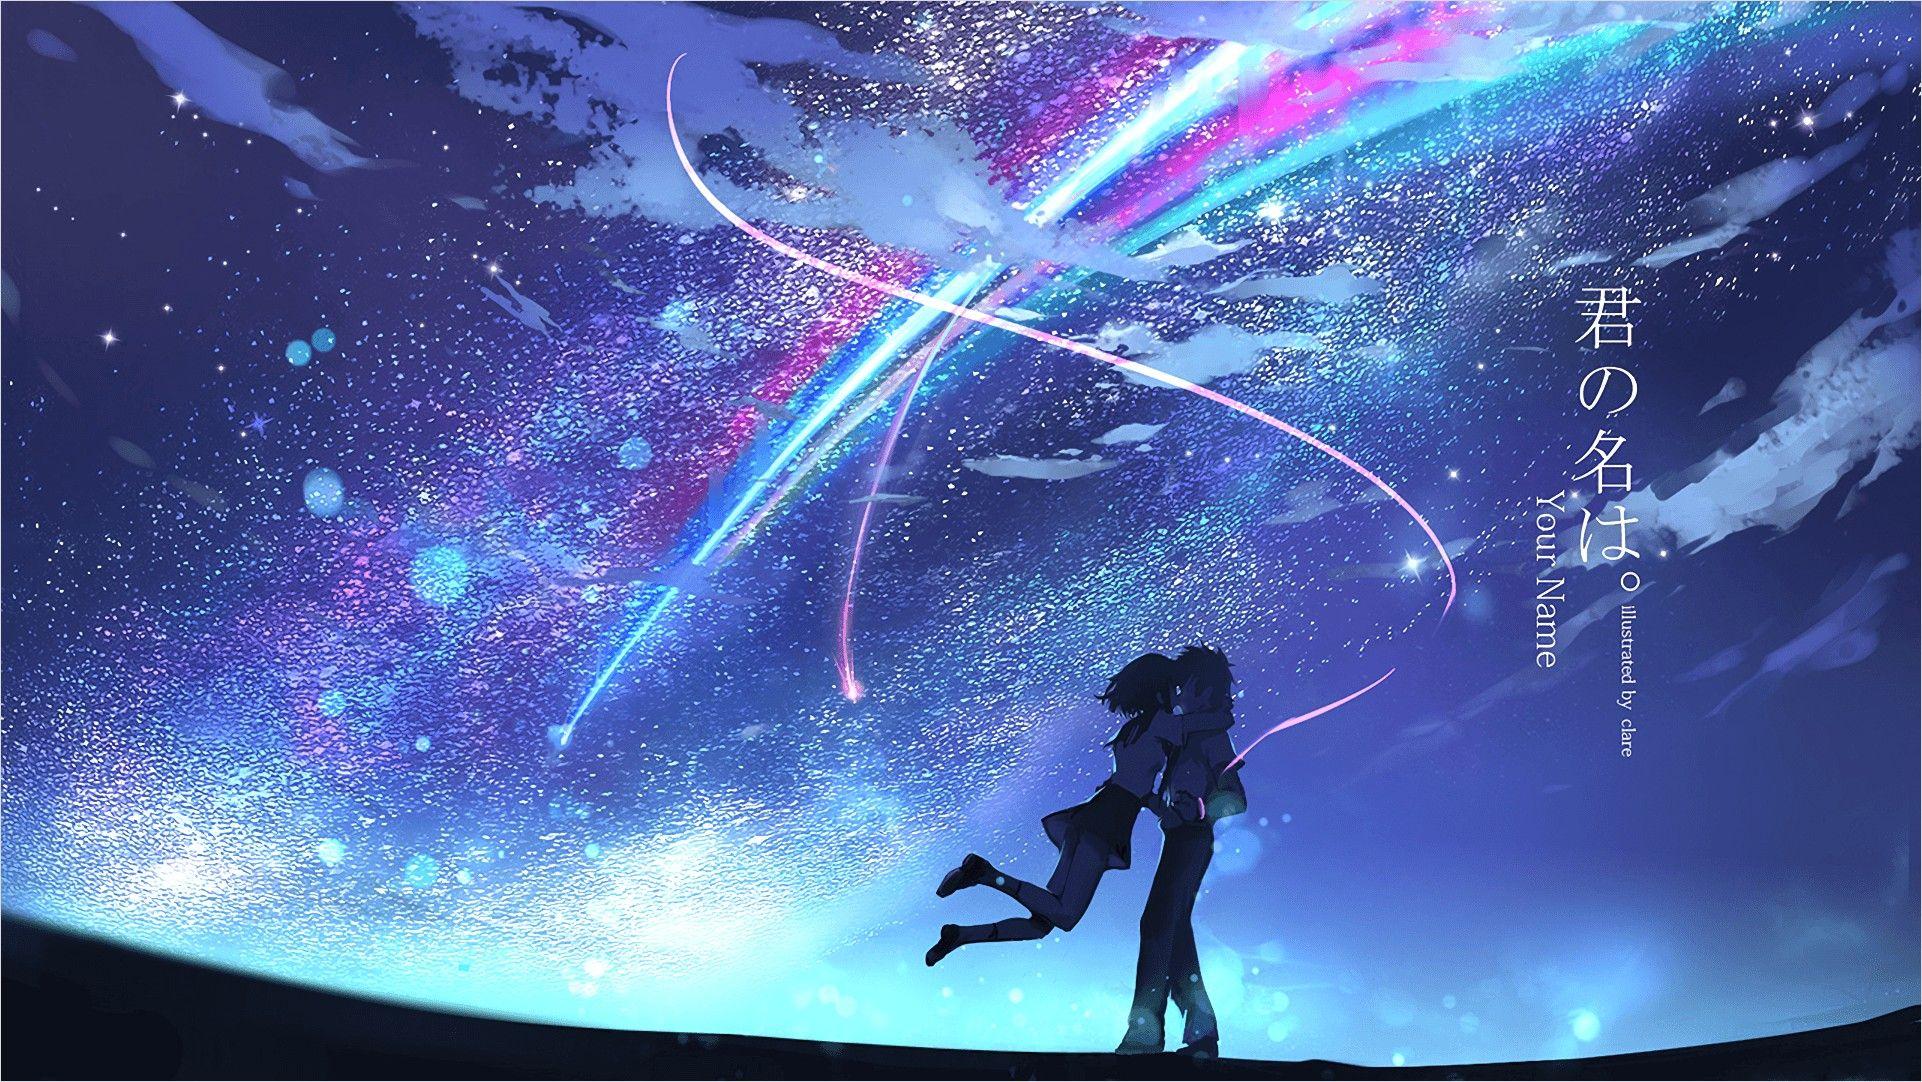 4k Anime With Name Wallpaper in 2020 Kimi no na wa wallpaper 1922x1082